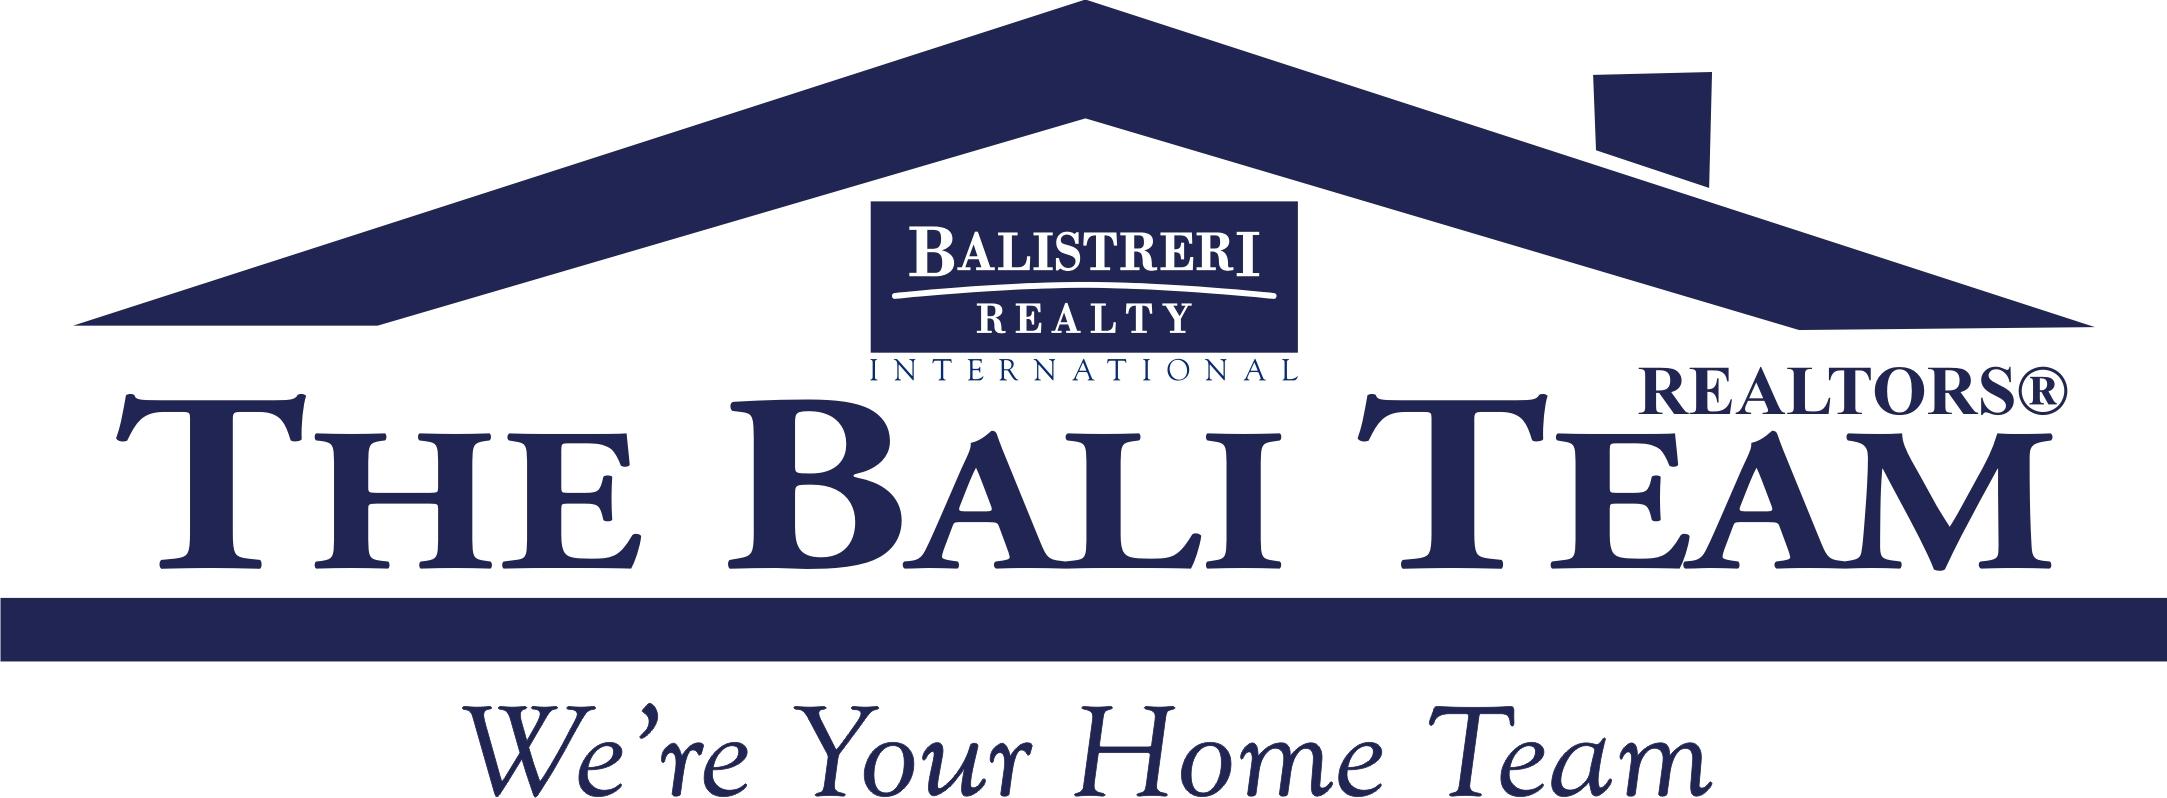 Balistreri Realty International